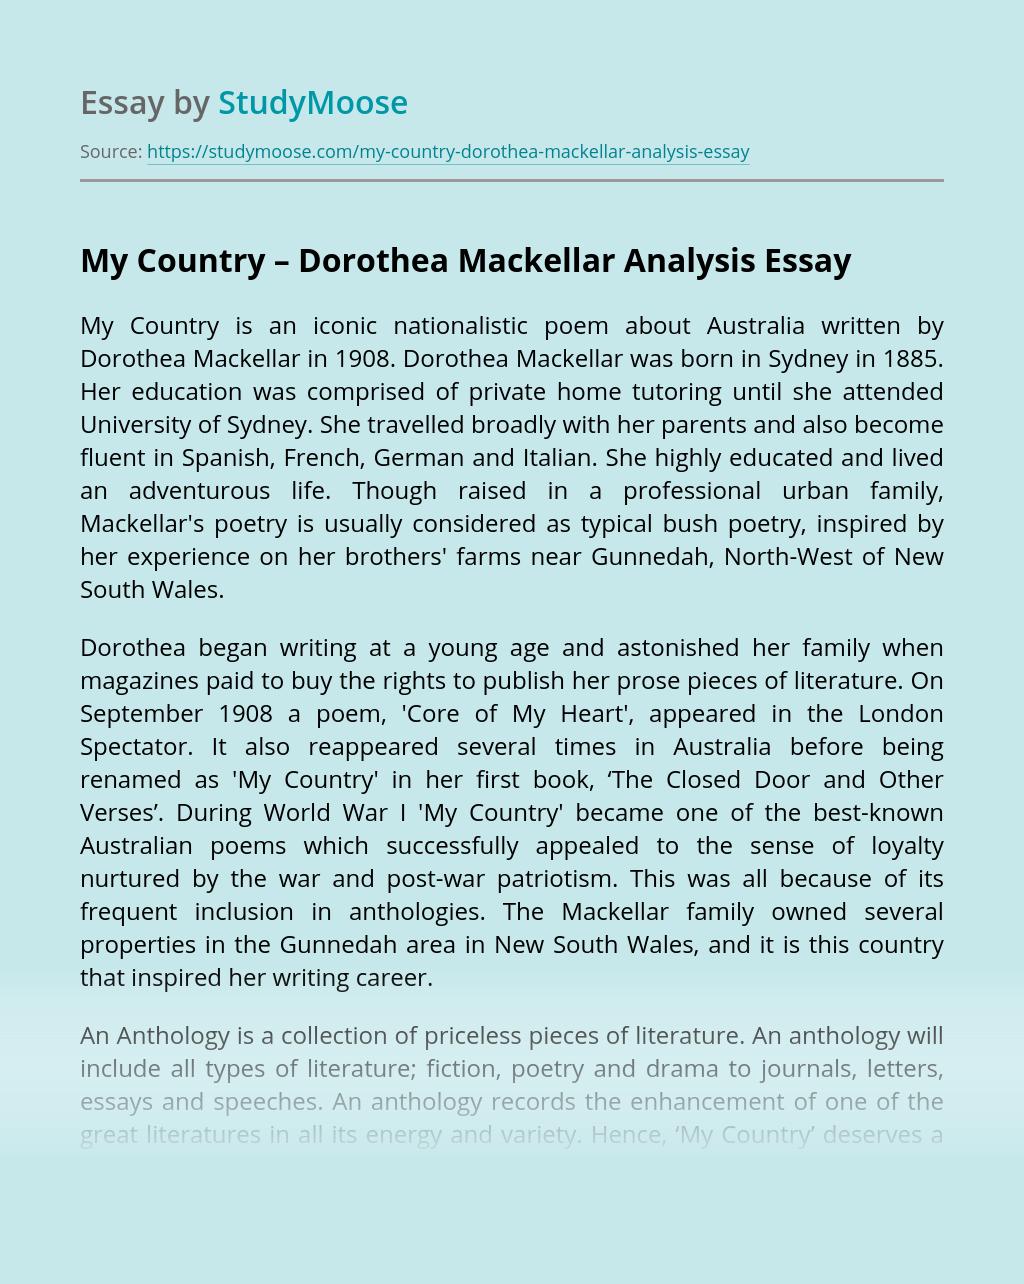 My Country – Dorothea Mackellar Analysis